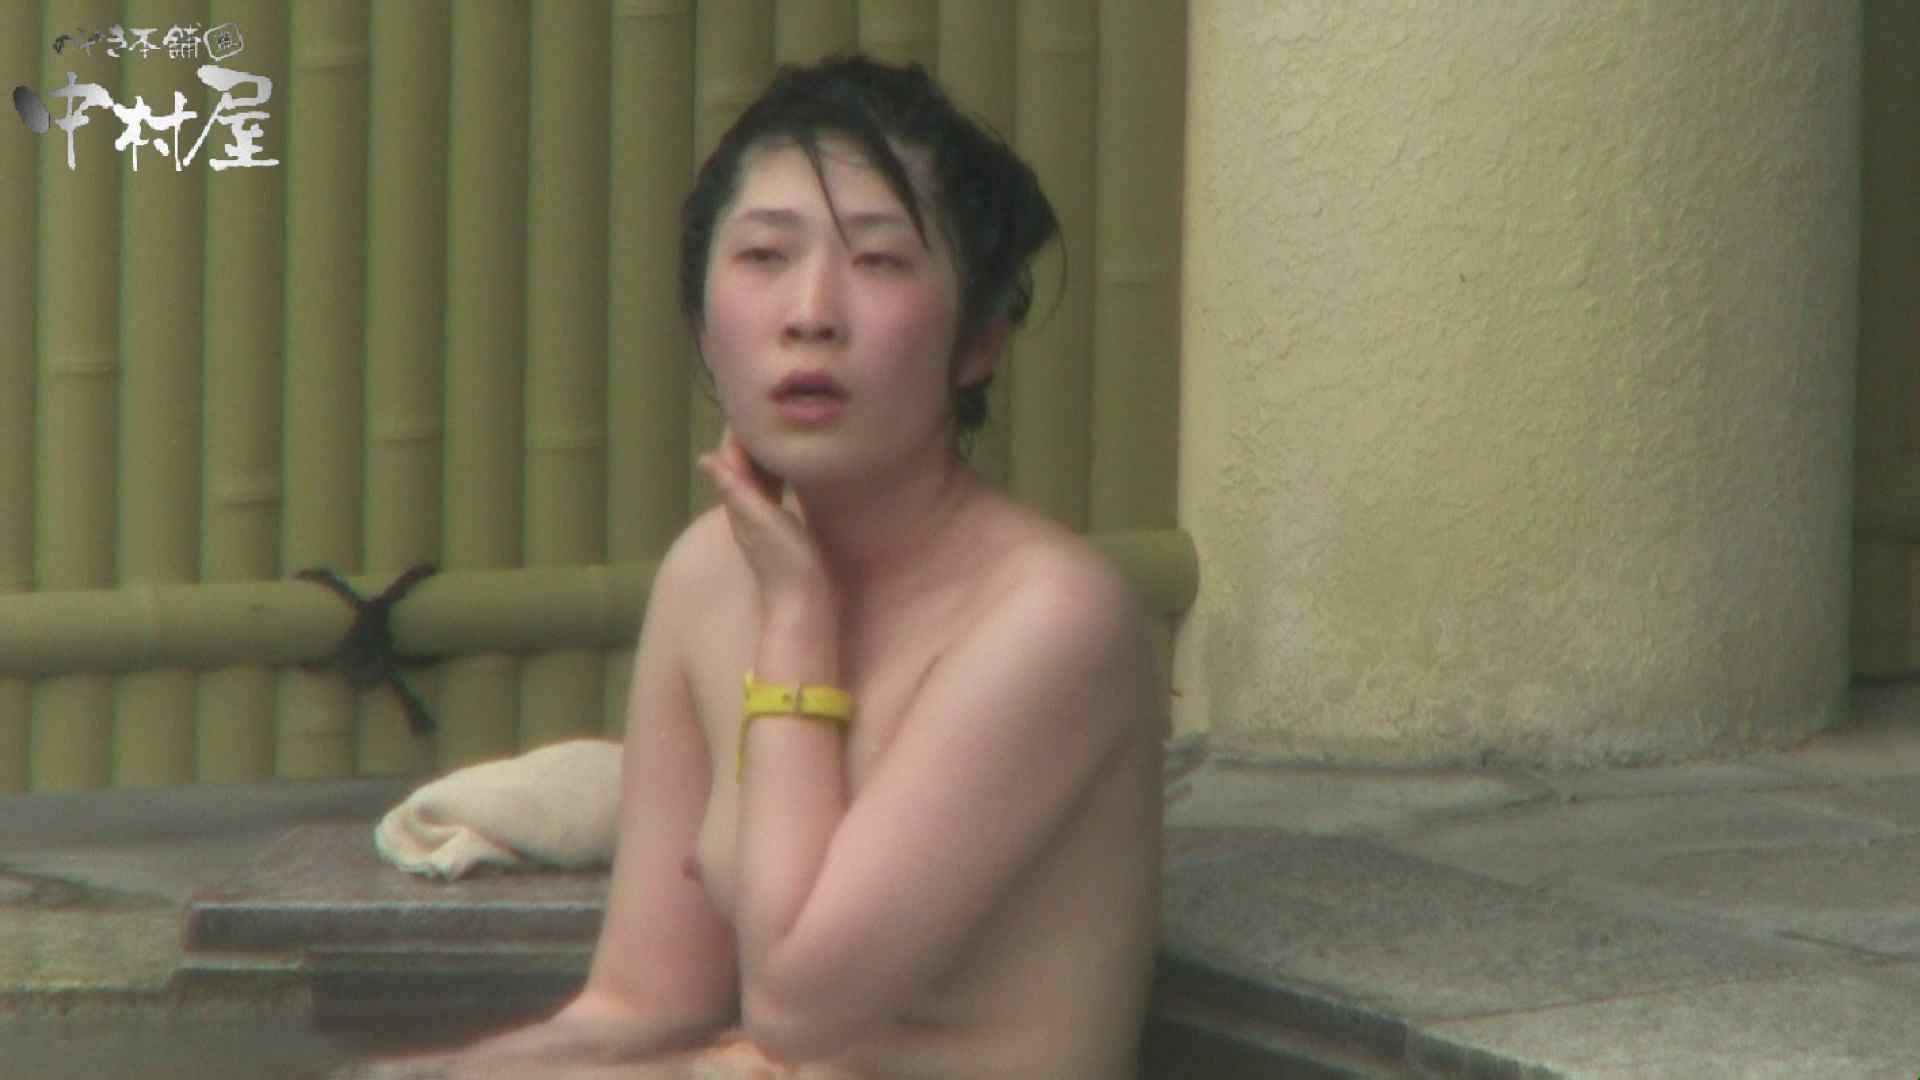 Aquaな露天風呂Vol.955 盗撮師作品 | 露天風呂突入  85pic 31